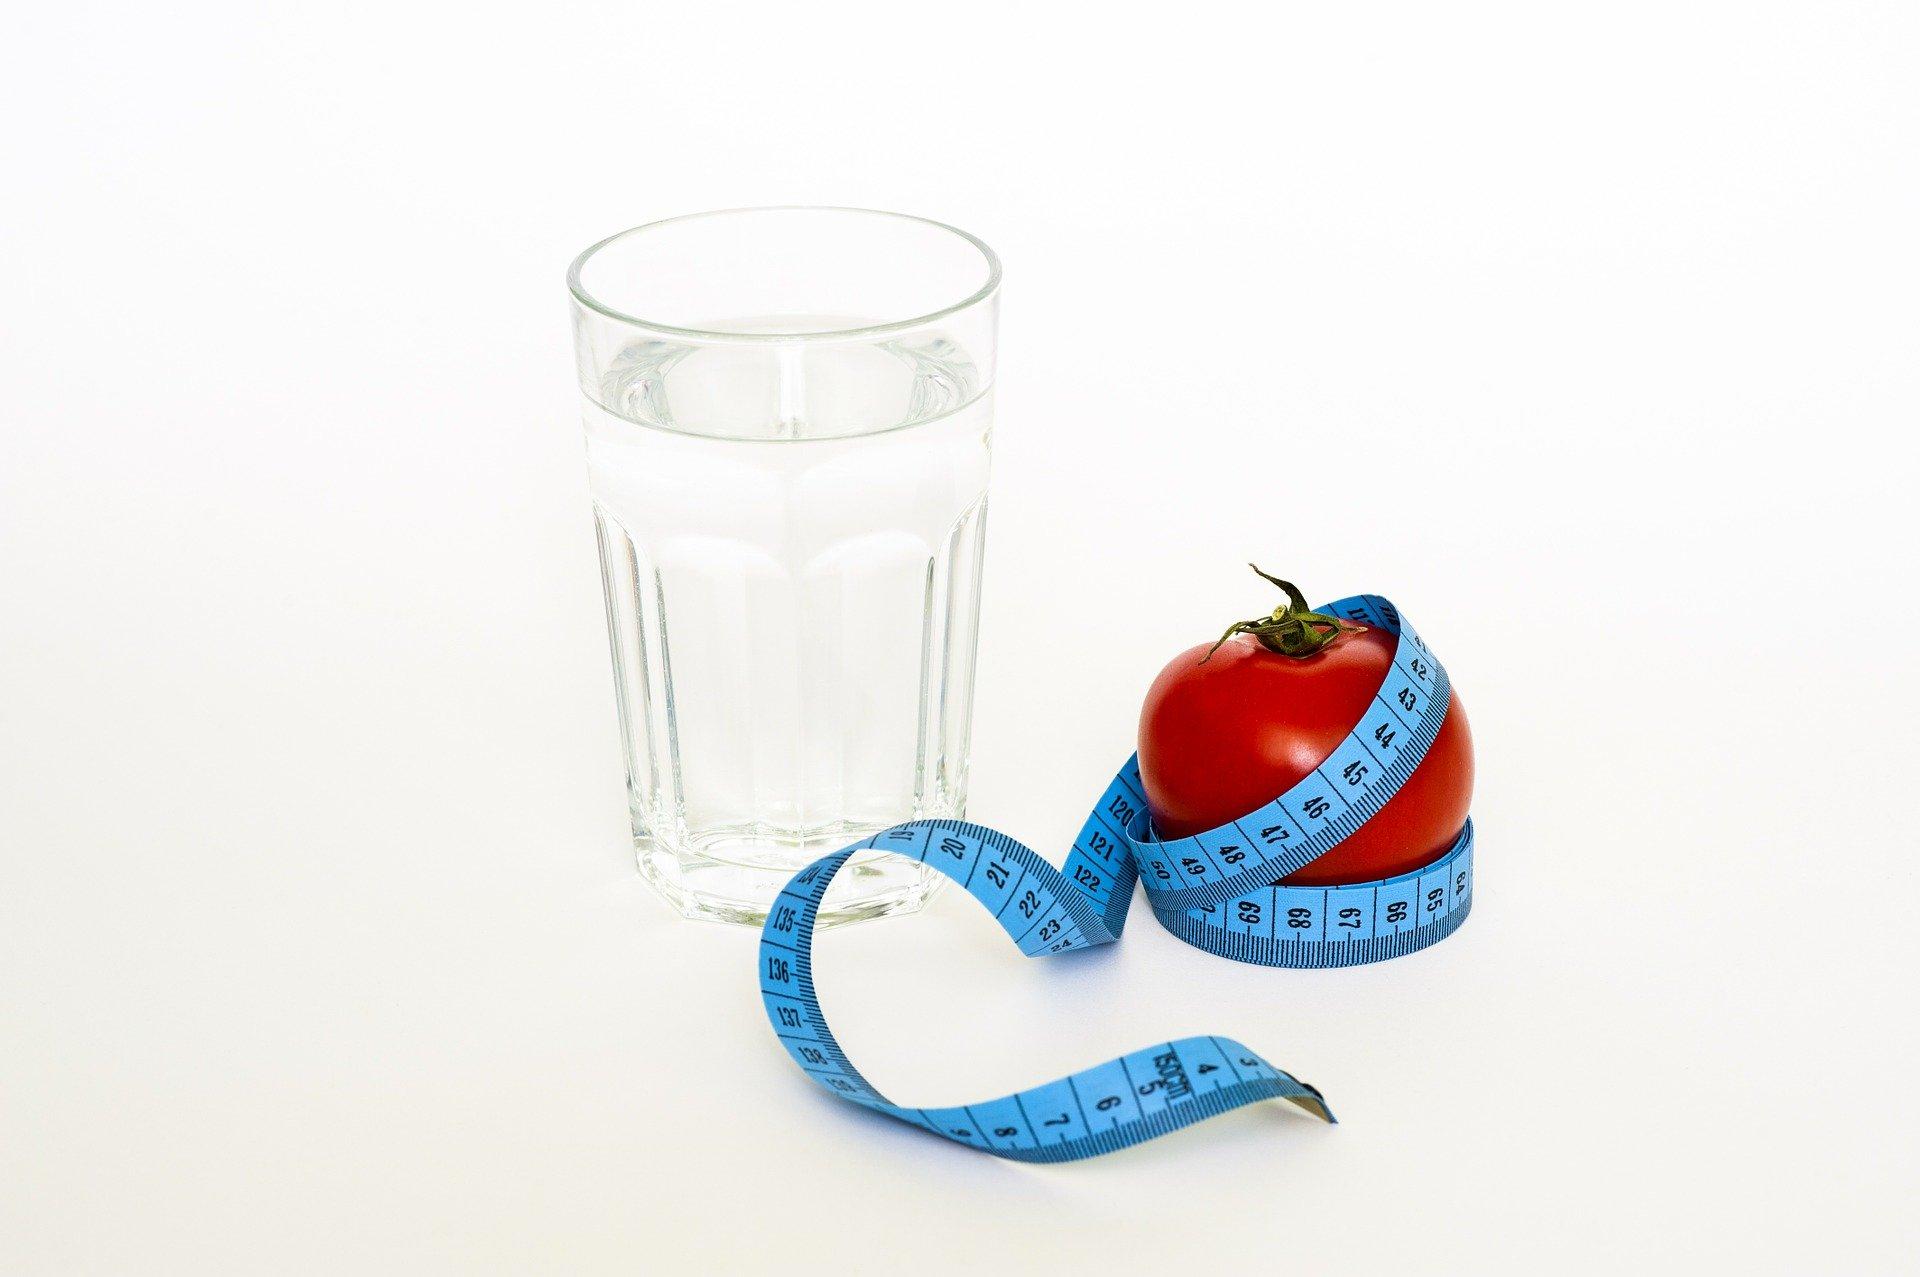 7 Food Habits to Combat Hormonal Imbalance